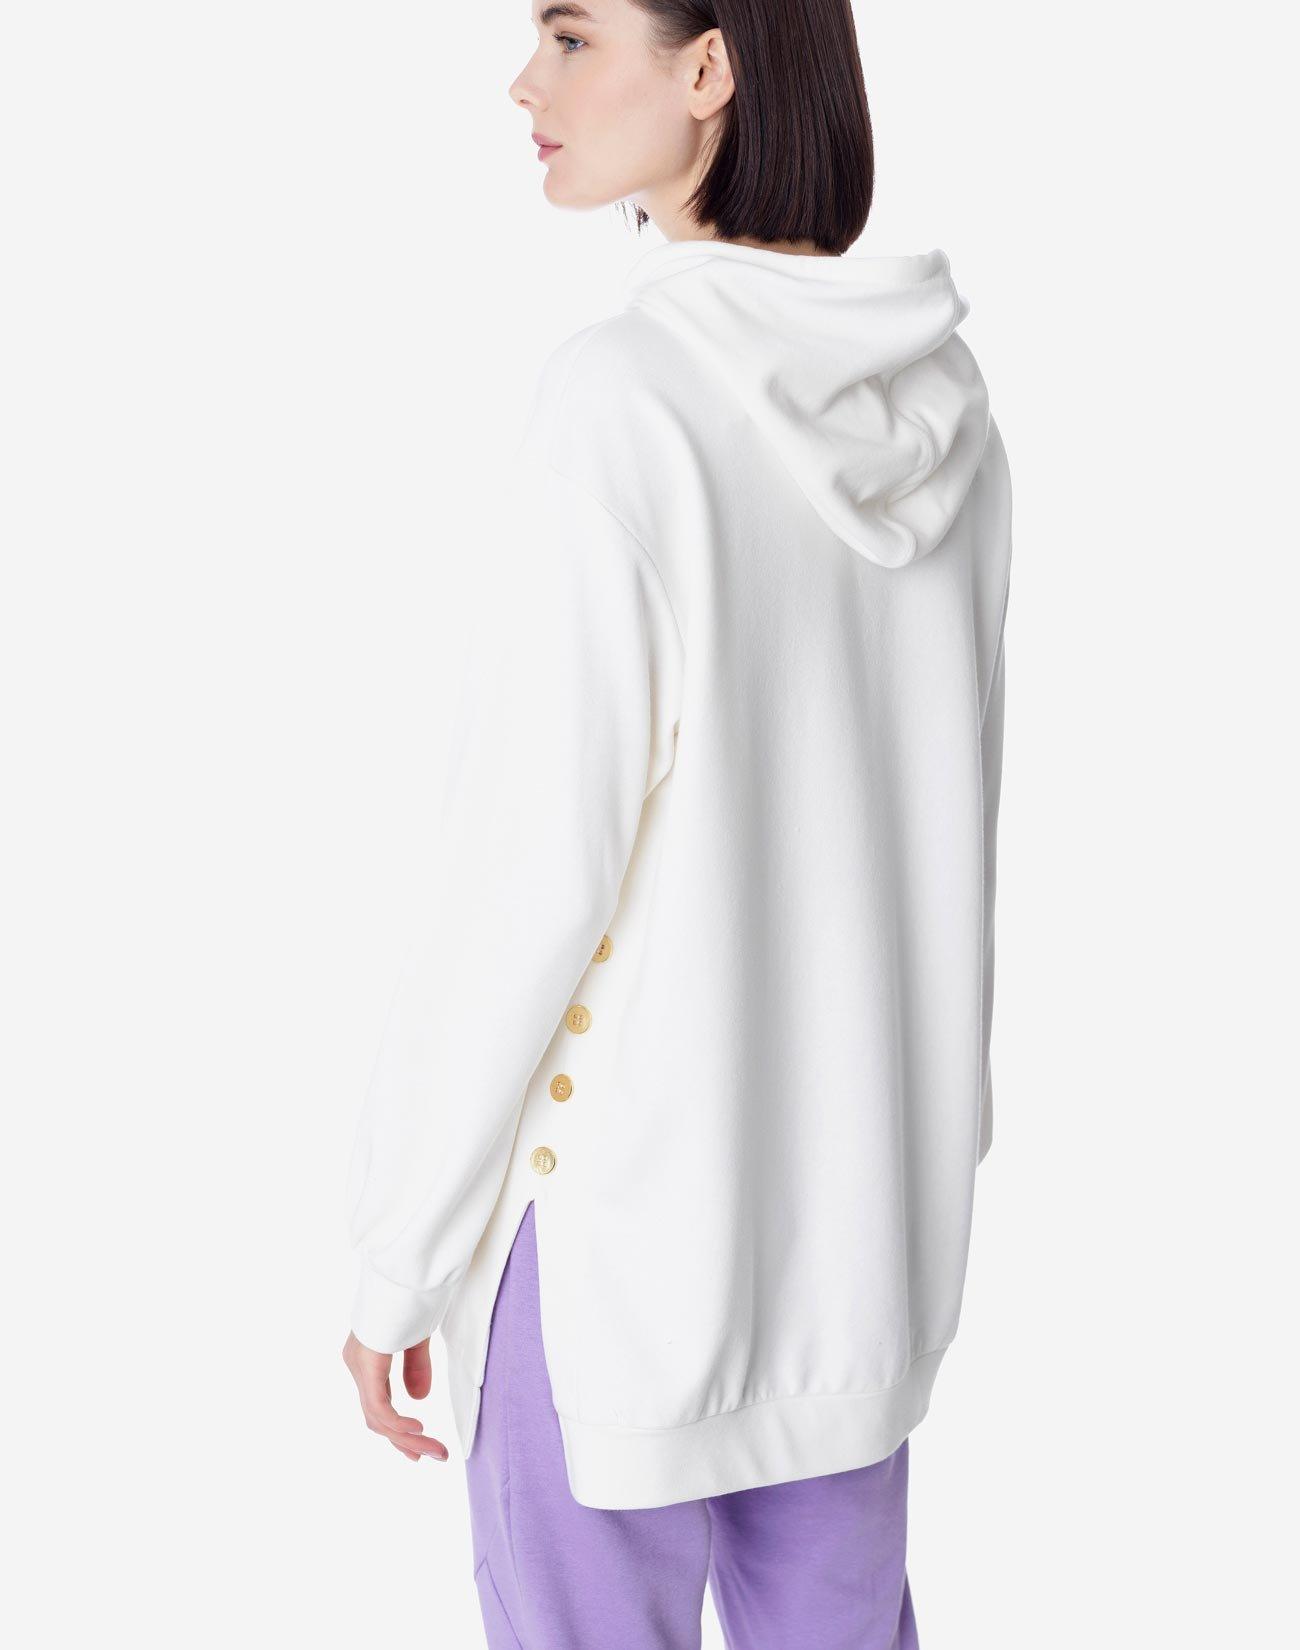 Sweatshirt with button detail